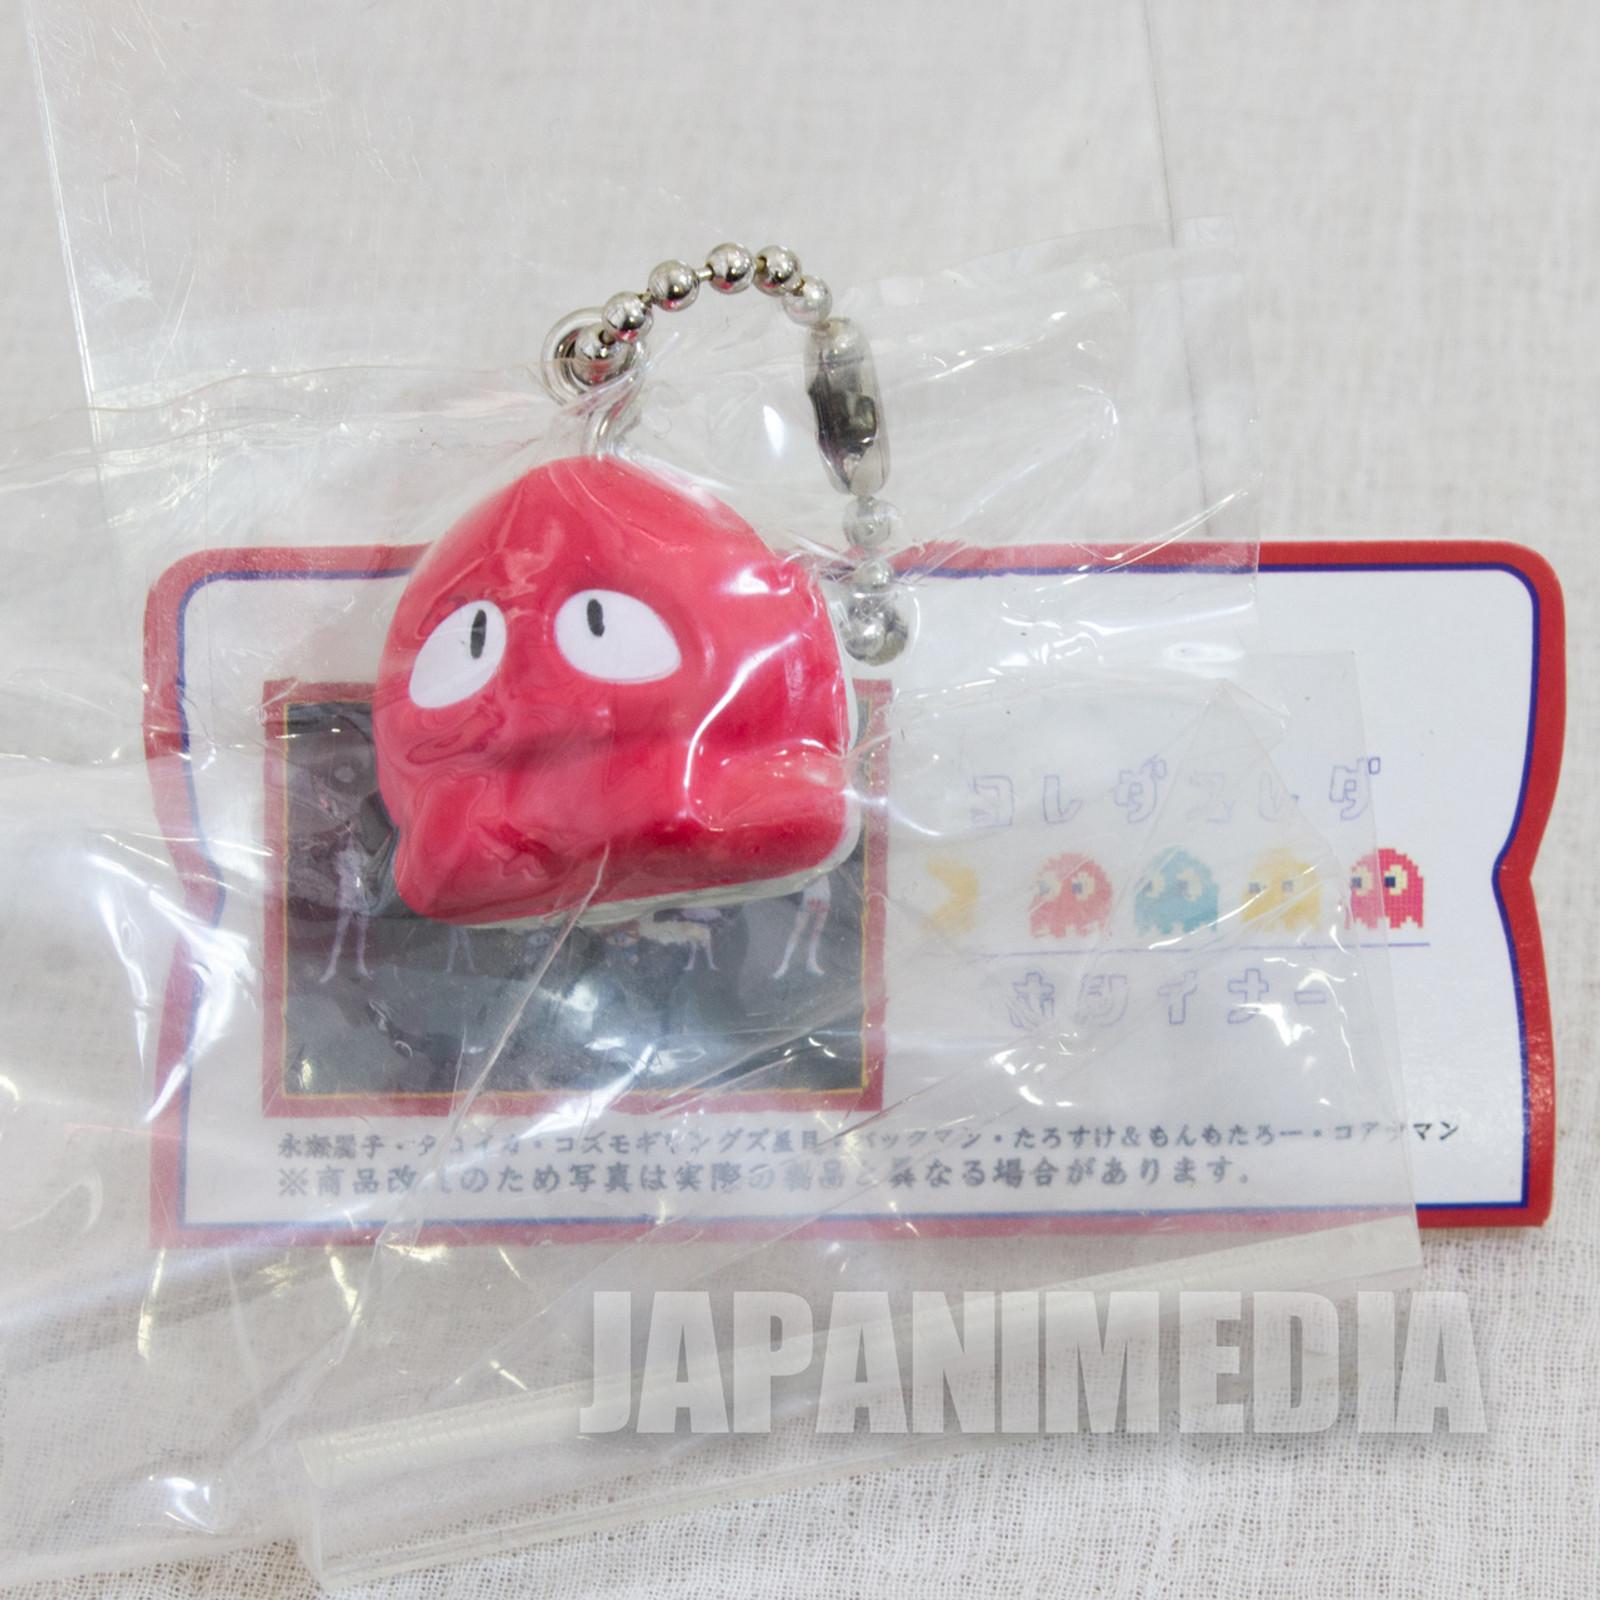 Retro Rare! Tako-Ika Panic Color Figure Ballchain Namco JAPAN